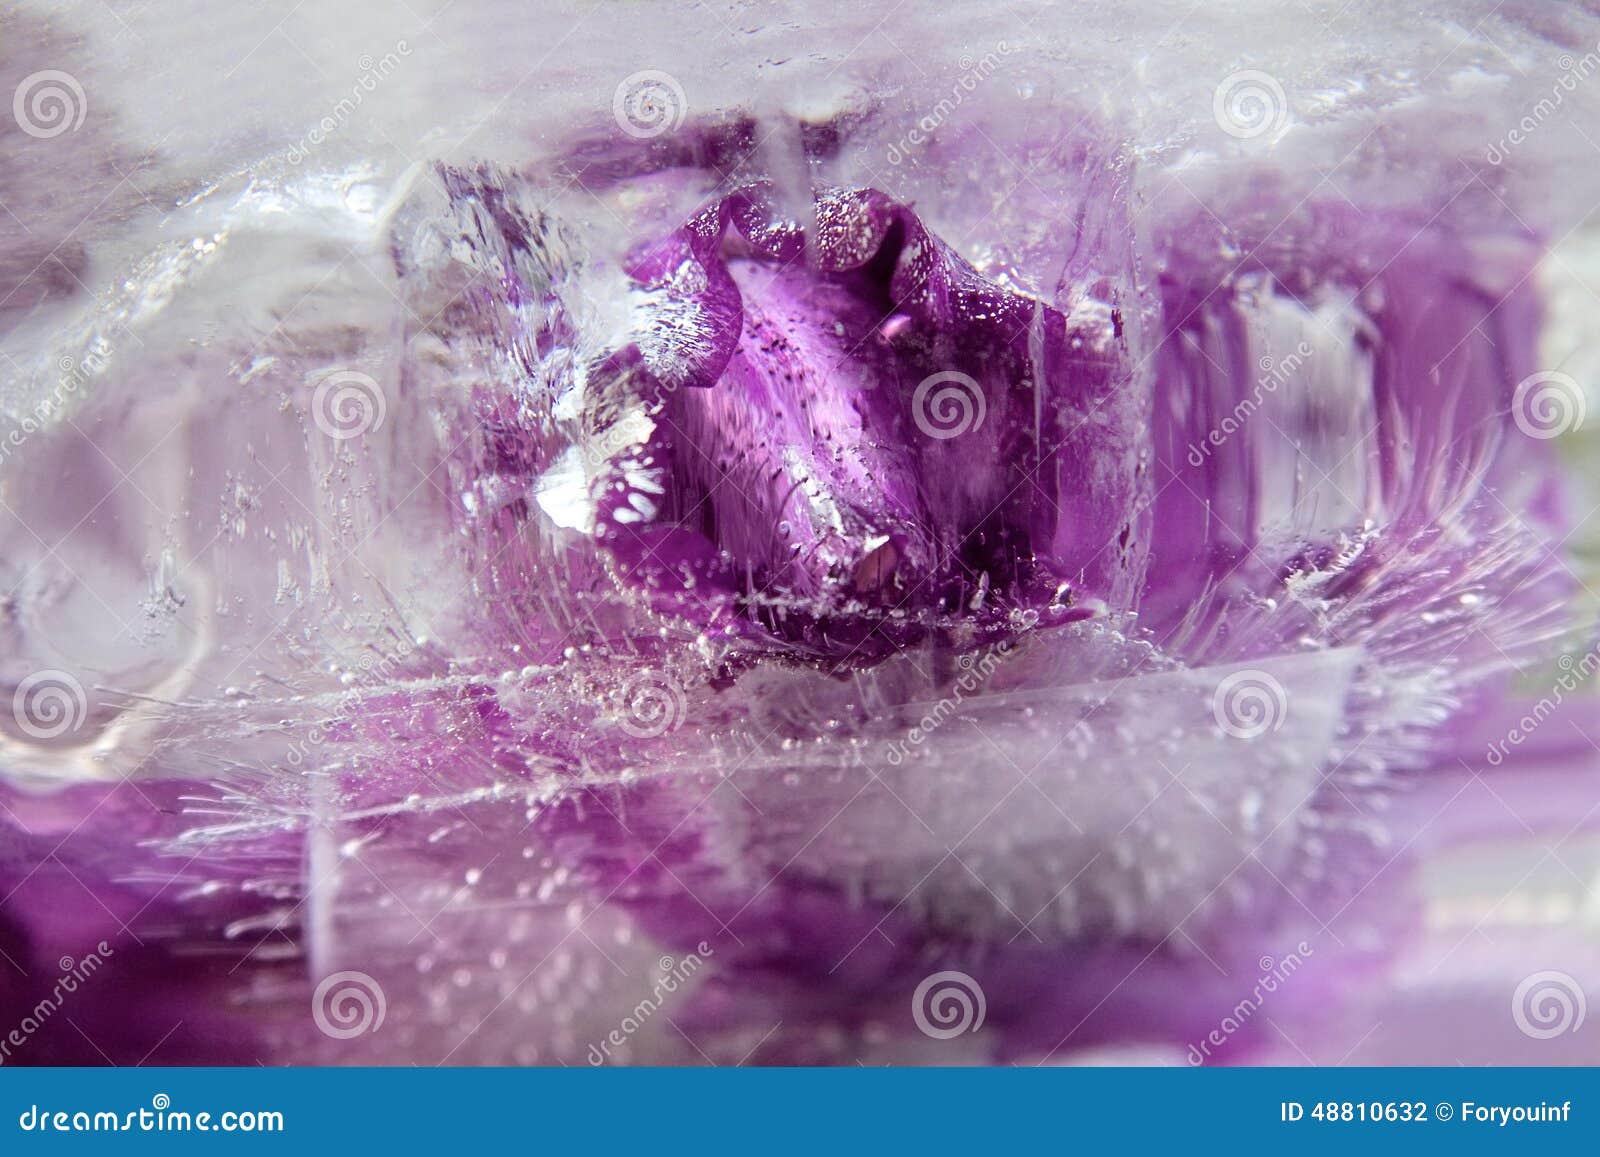 Frozen Flower Gladiolus Stock Image